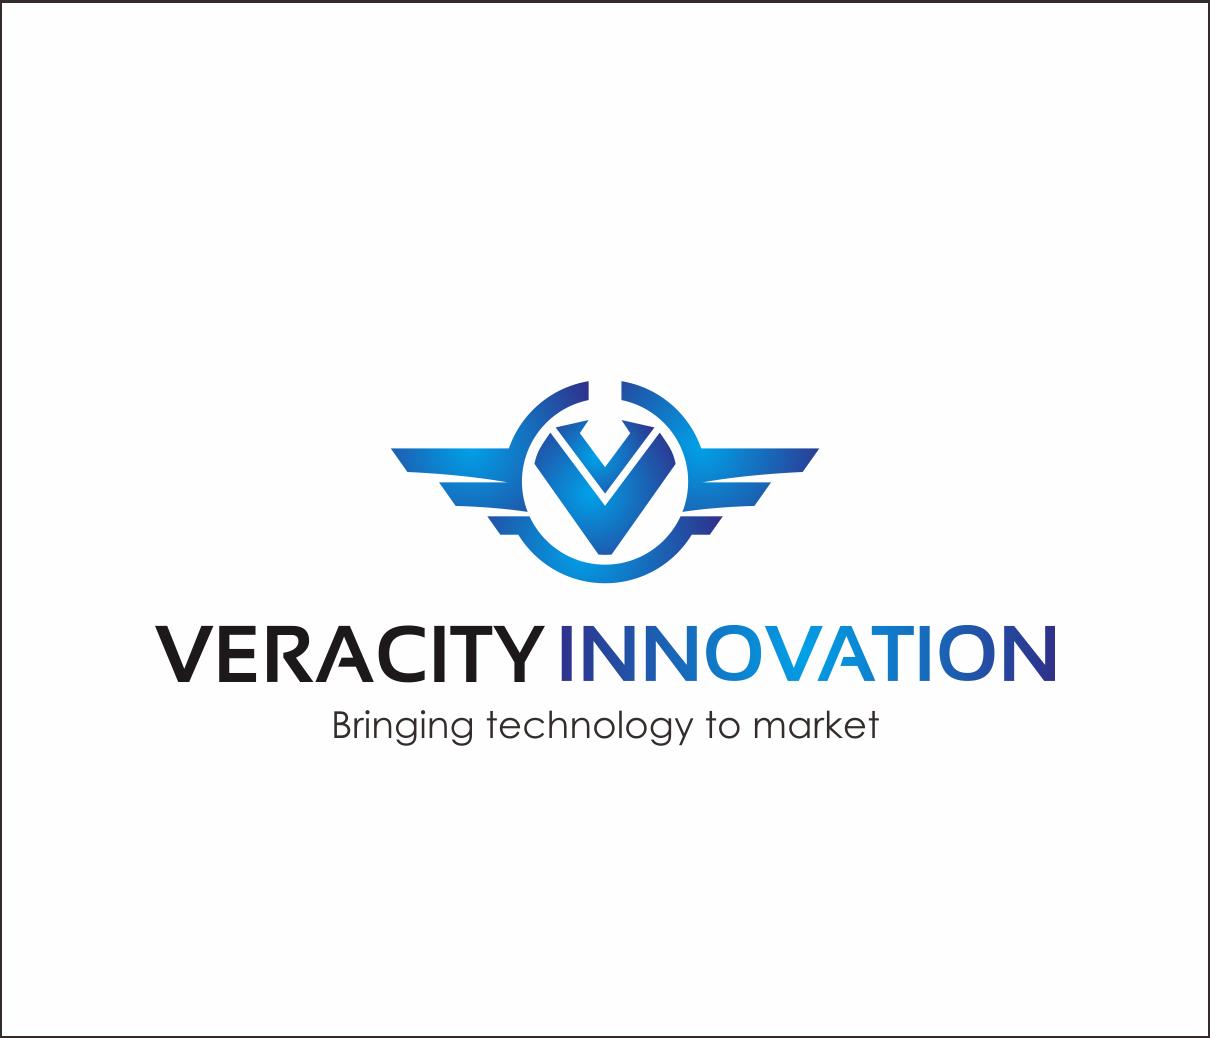 Logo Design by Armada Jamaluddin - Entry No. 288 in the Logo Design Contest Creative Logo Design for Veracity Innovation, LLC.